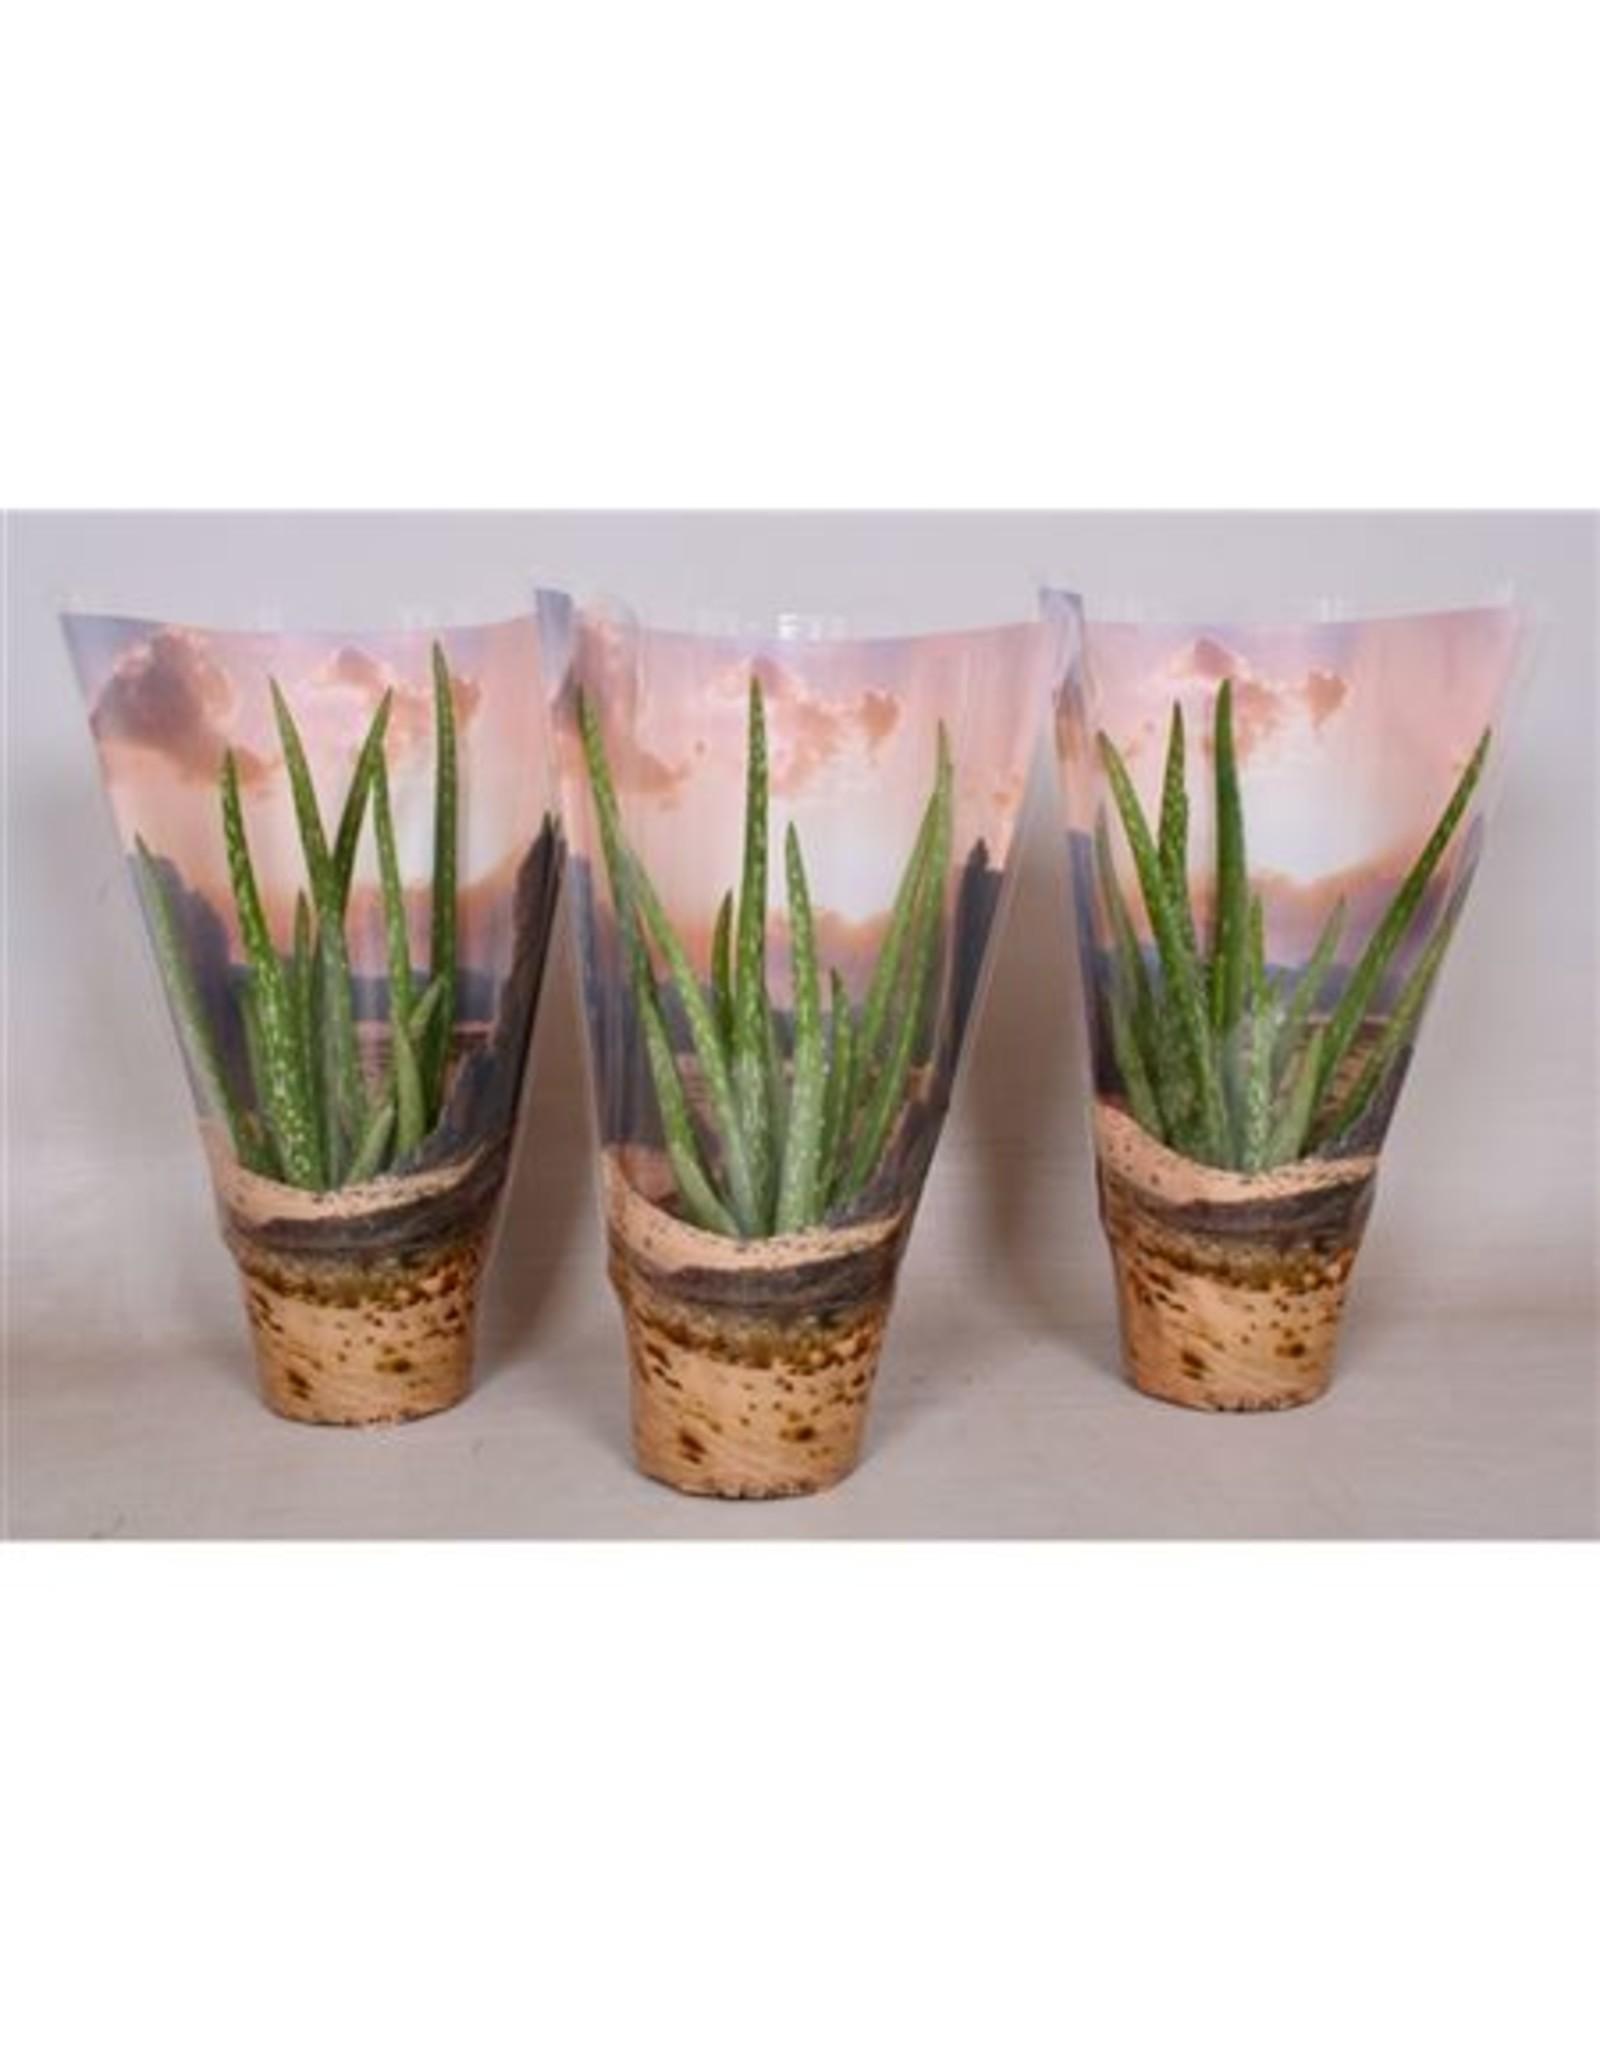 VDP Aloe Vera Desert Hoes. x 6